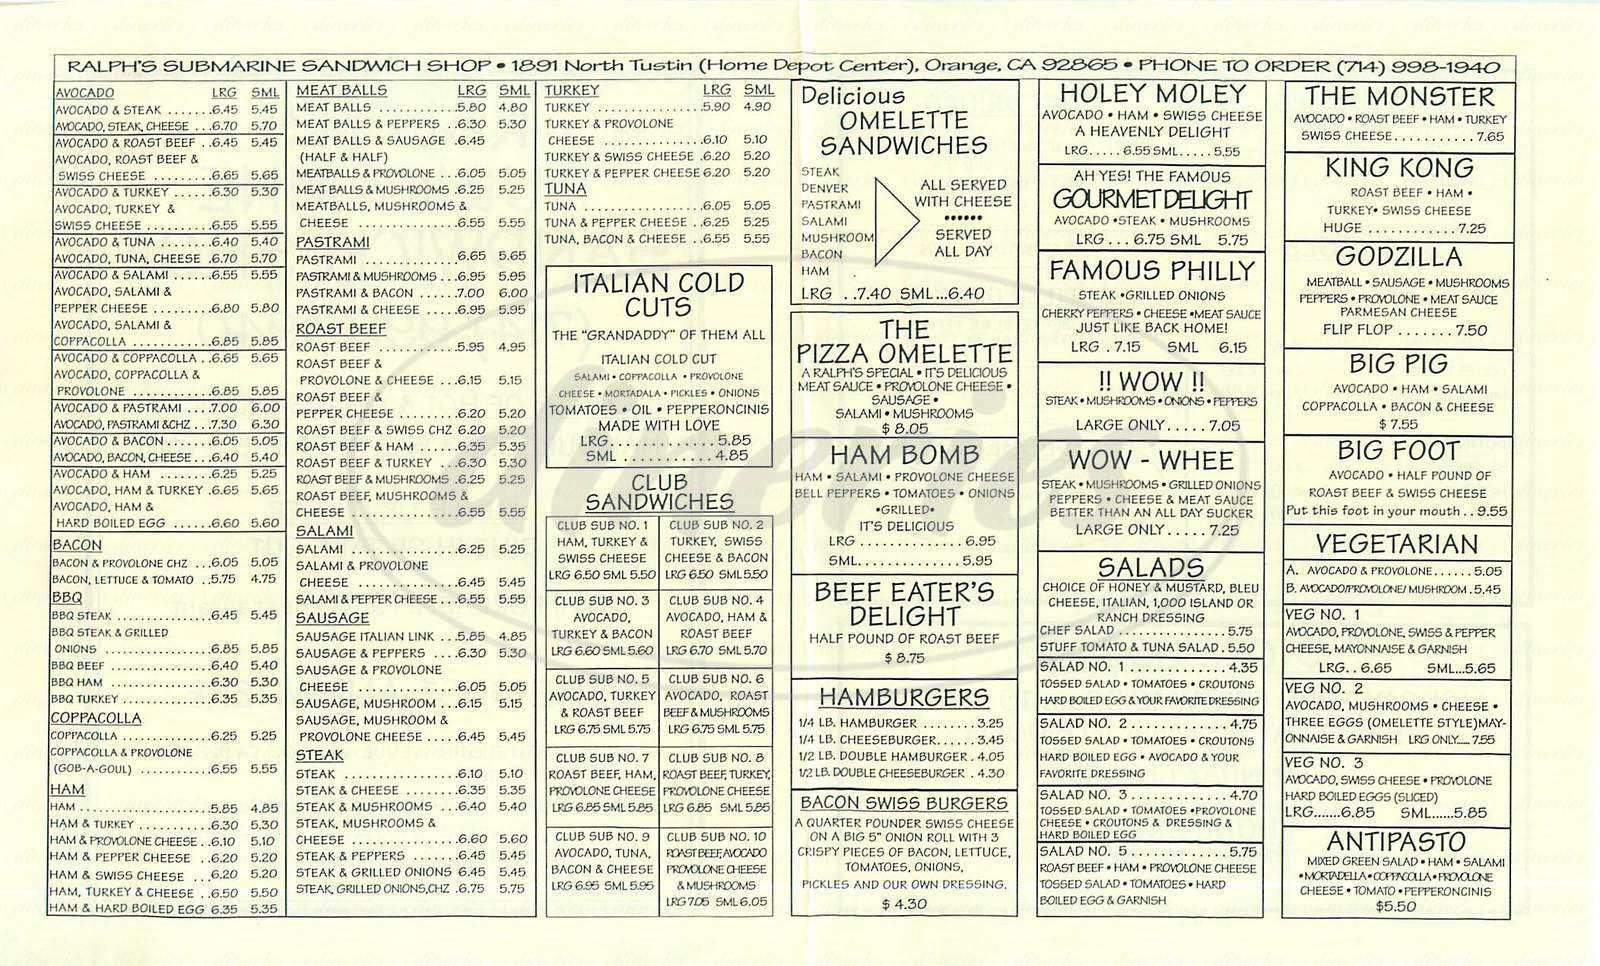 menu for Ralph's Submarine Shop